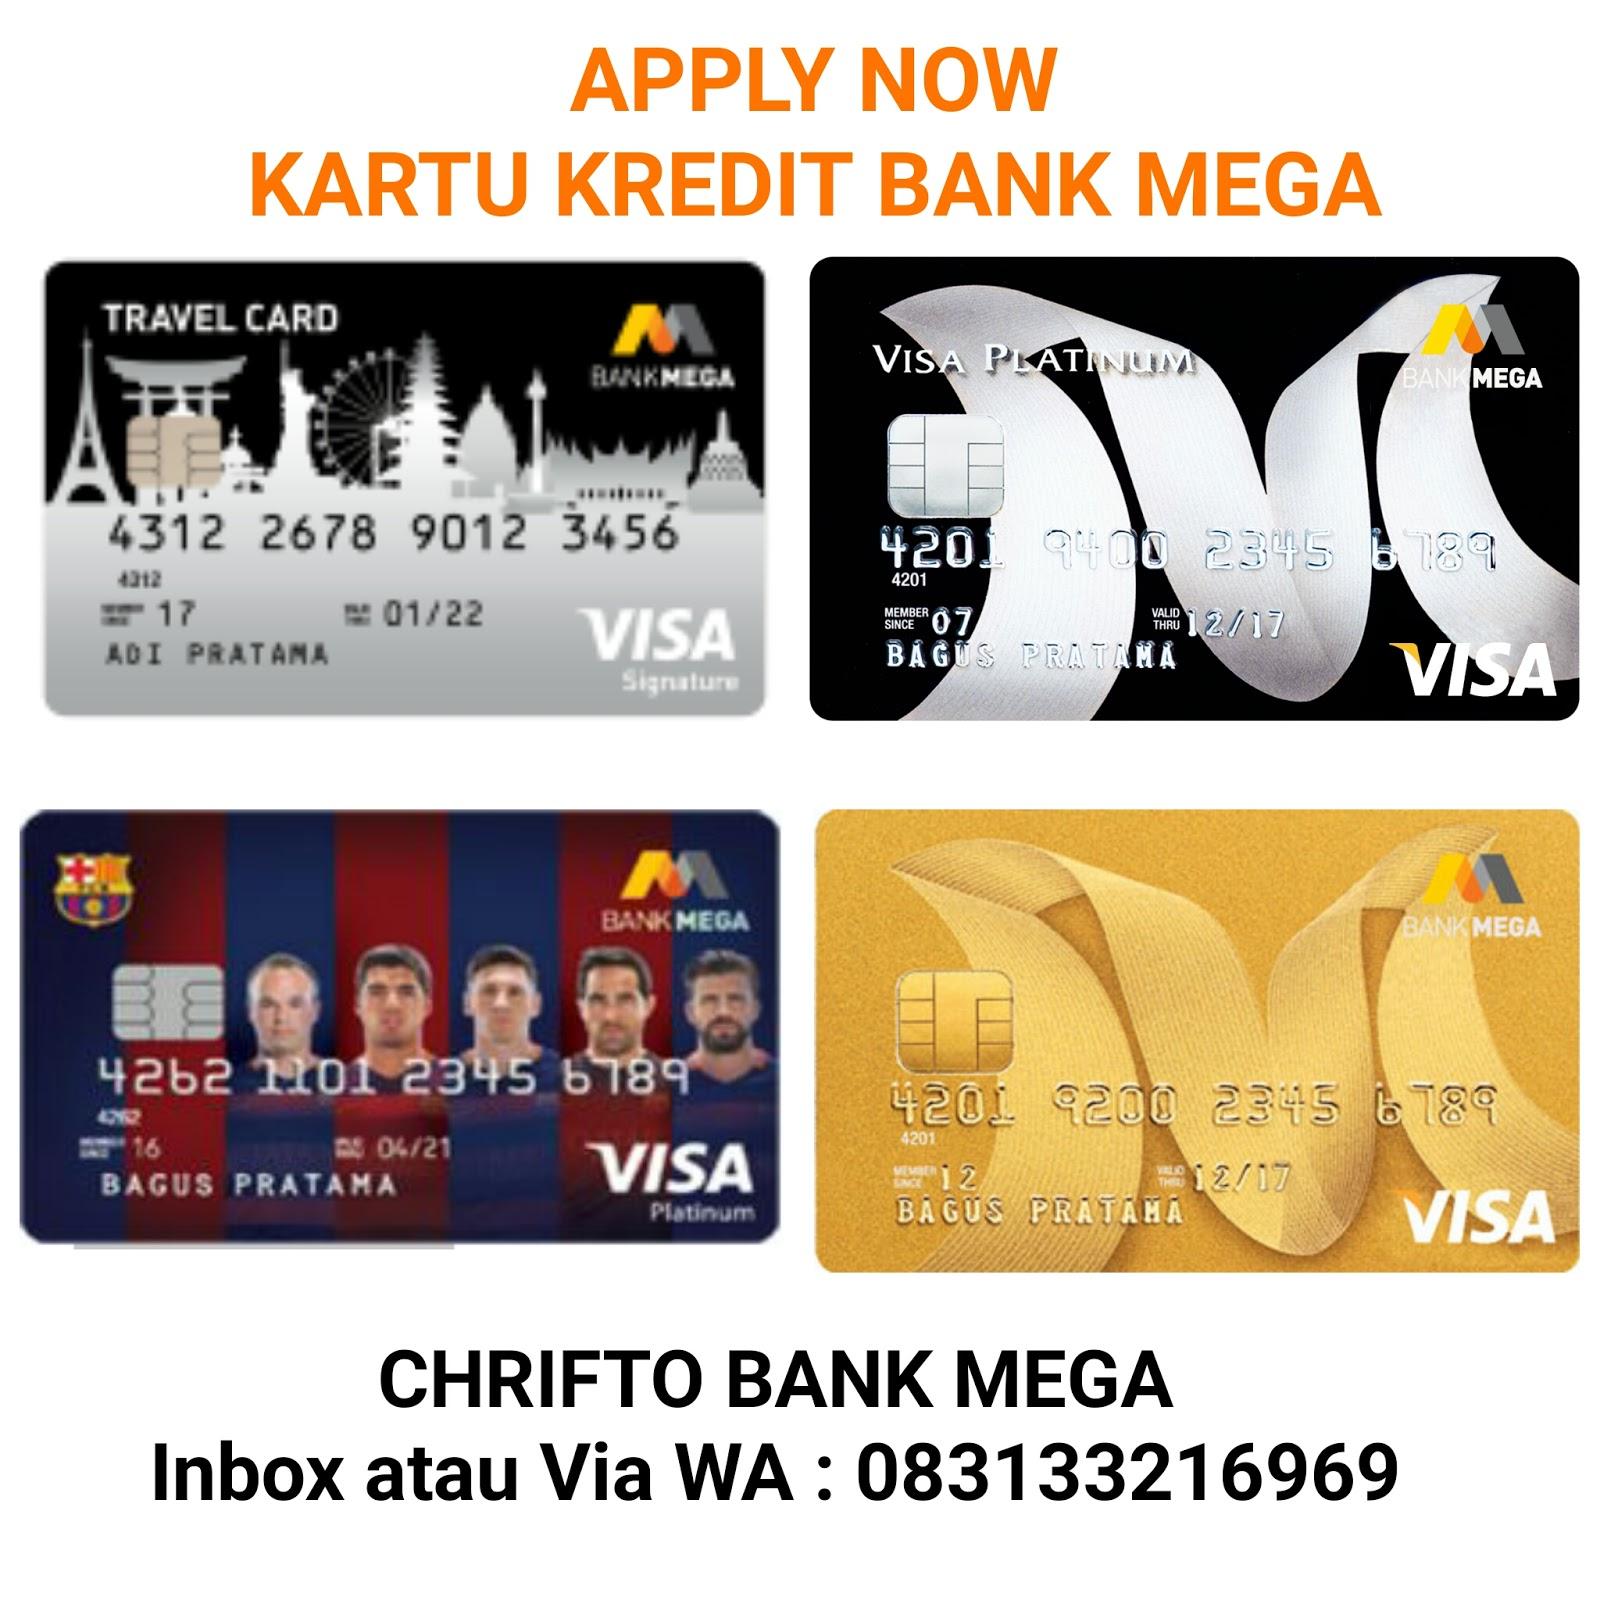 Apply Now Kartu Kredit Bank Mega Buat Sekarang Kartu Kredit Bank Mega